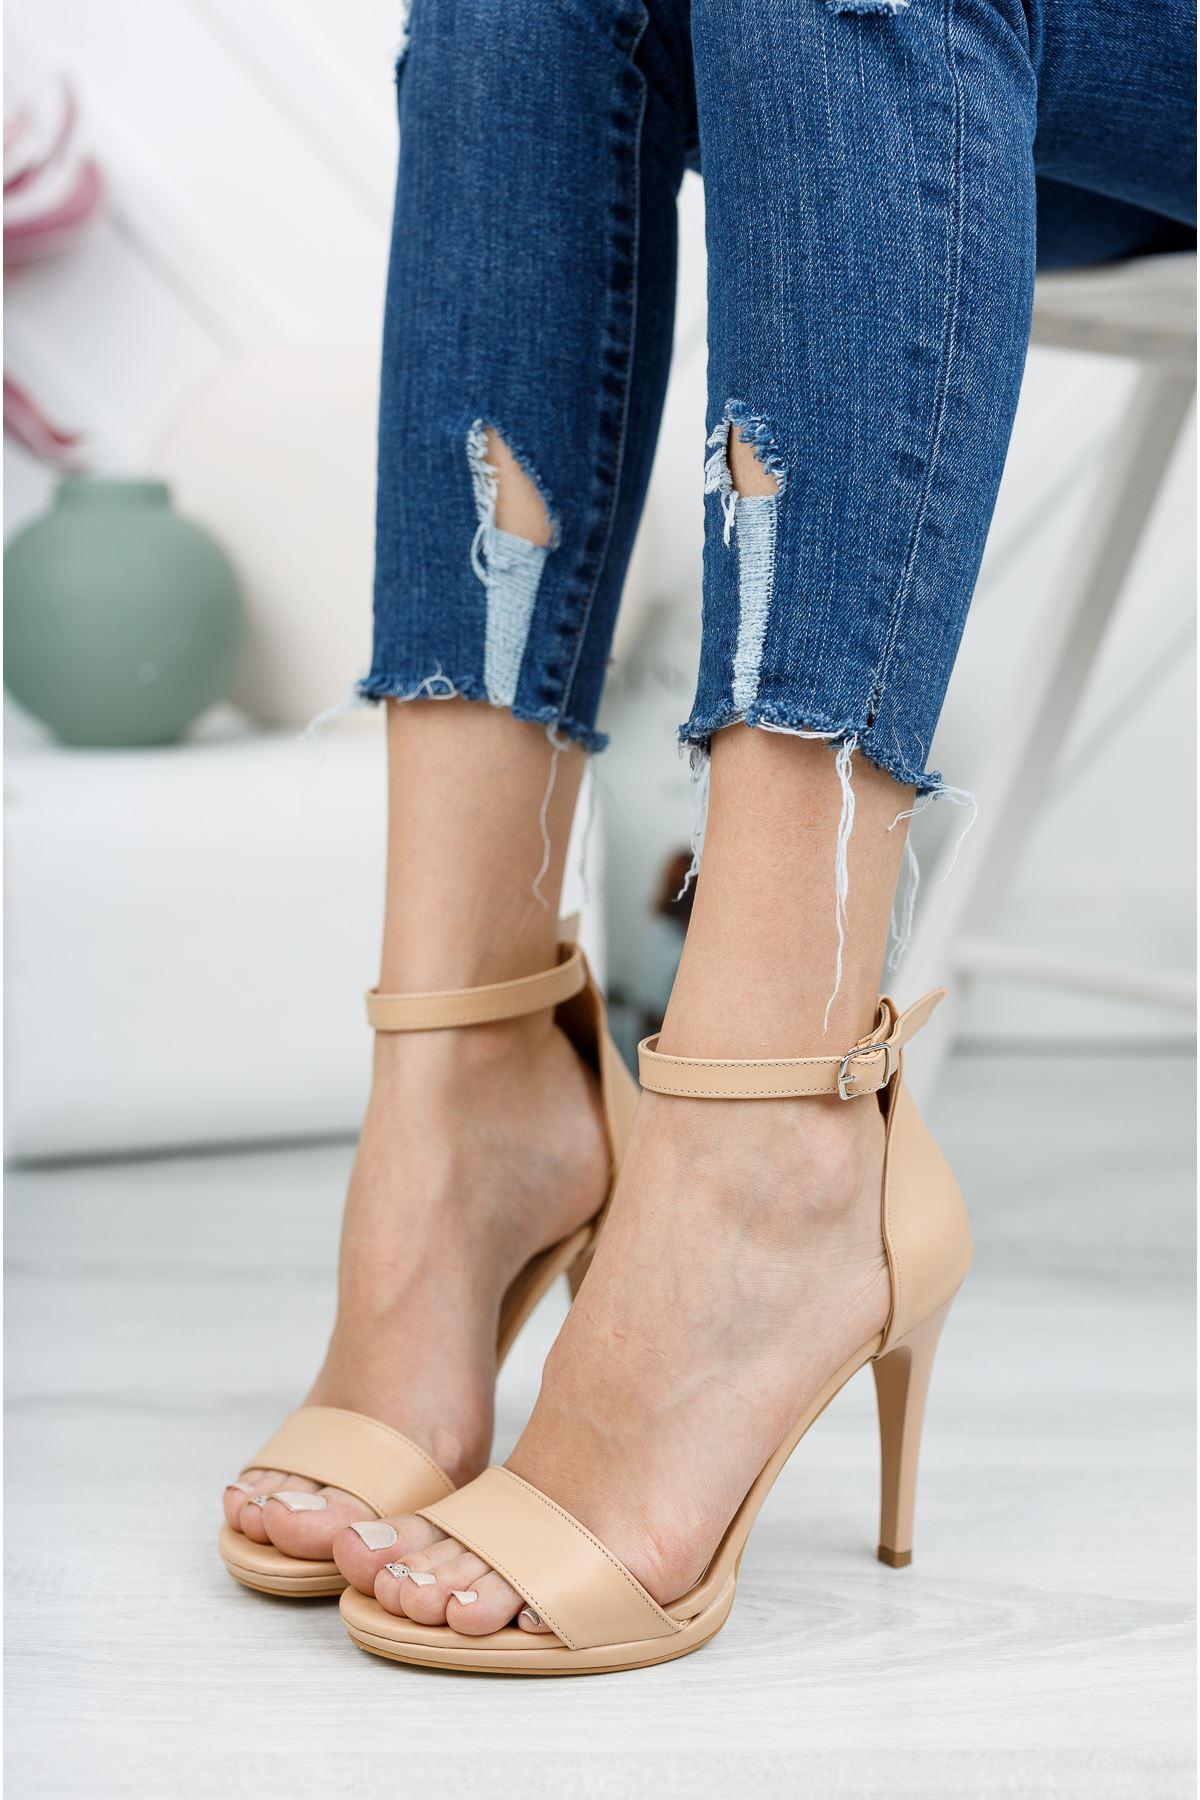 Nude Cilt İnce Topuklu Ayakkabı